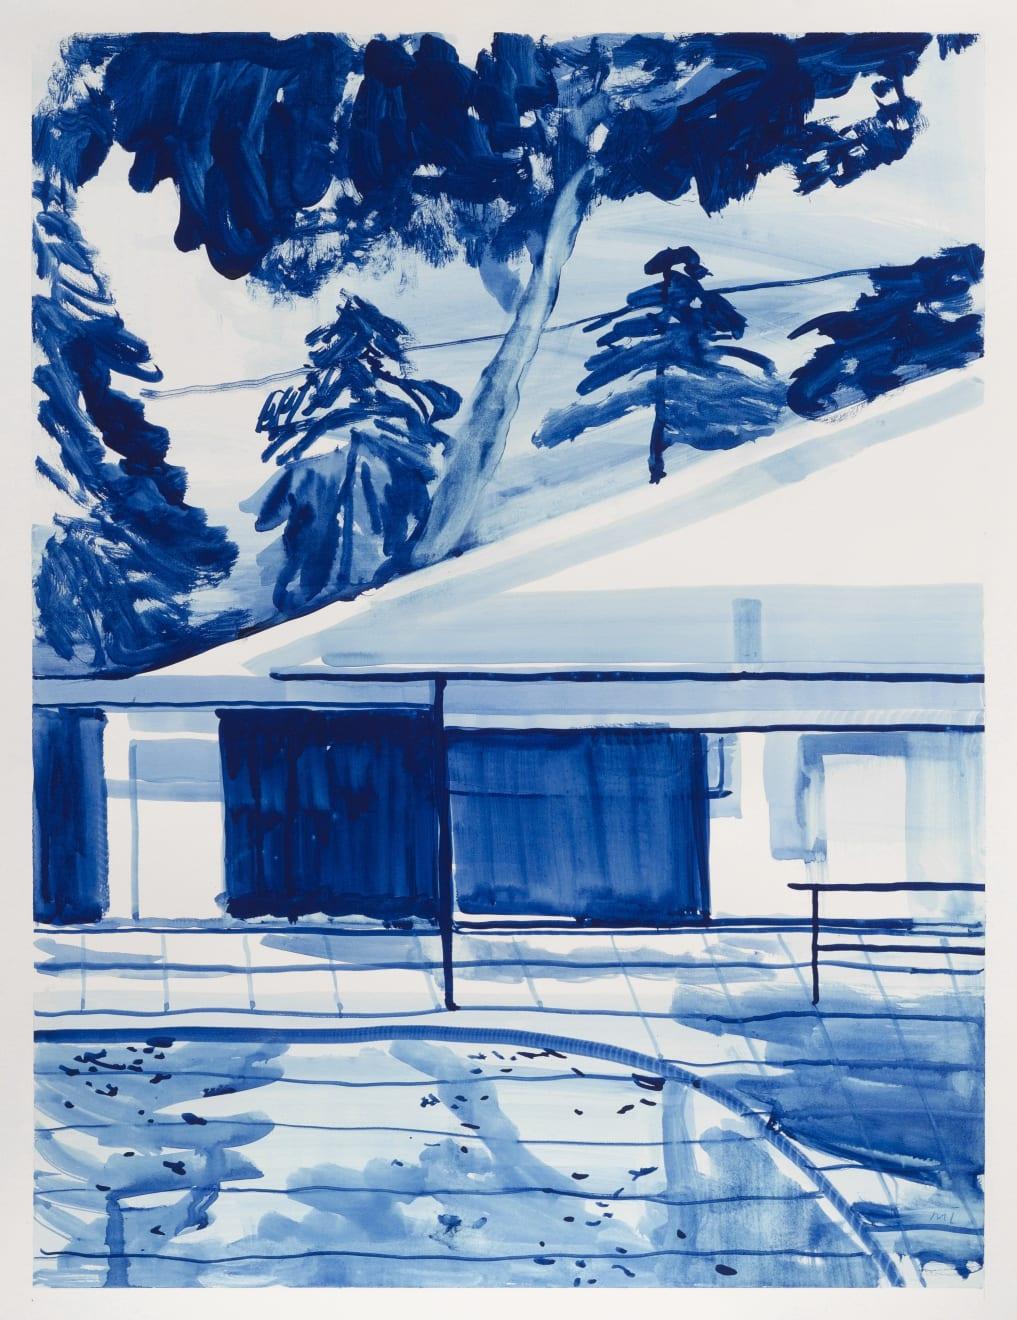 Michael Taylor Playing House Gouache on Paper Original 65 x 50 cm $3000 £1500